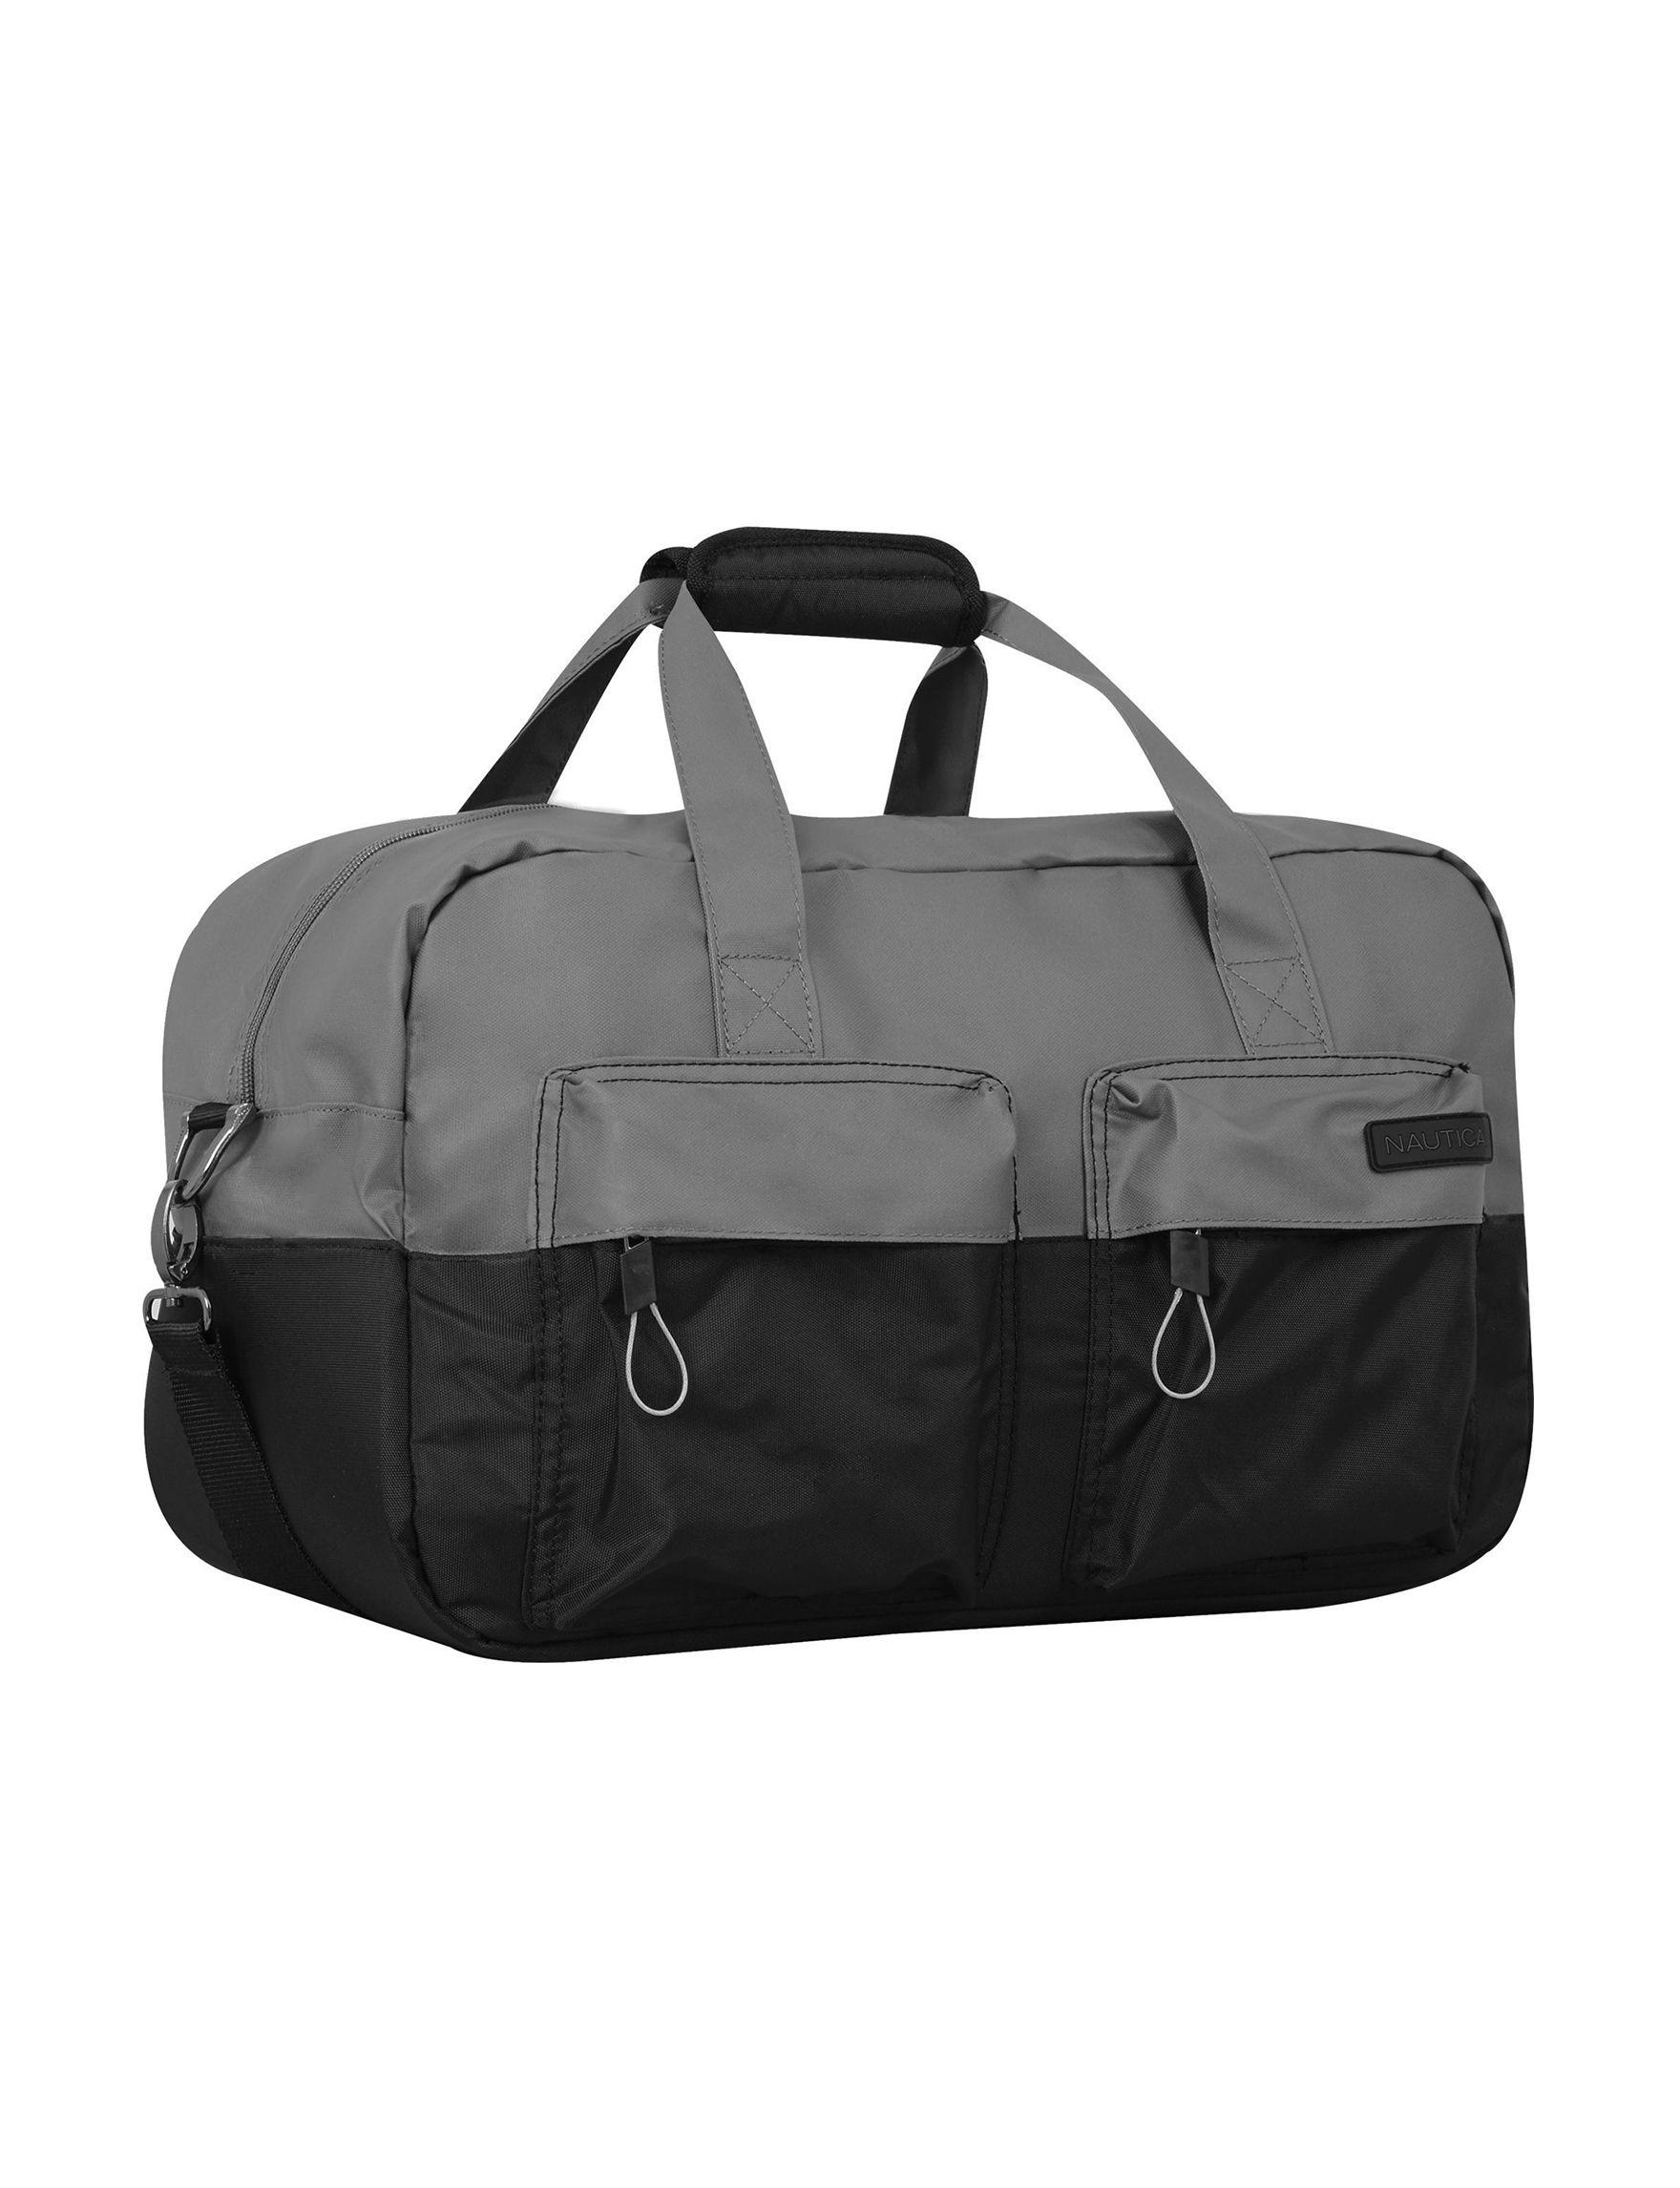 Nautica Grey Carry On Luggage Duffle Bags Weekend Bags